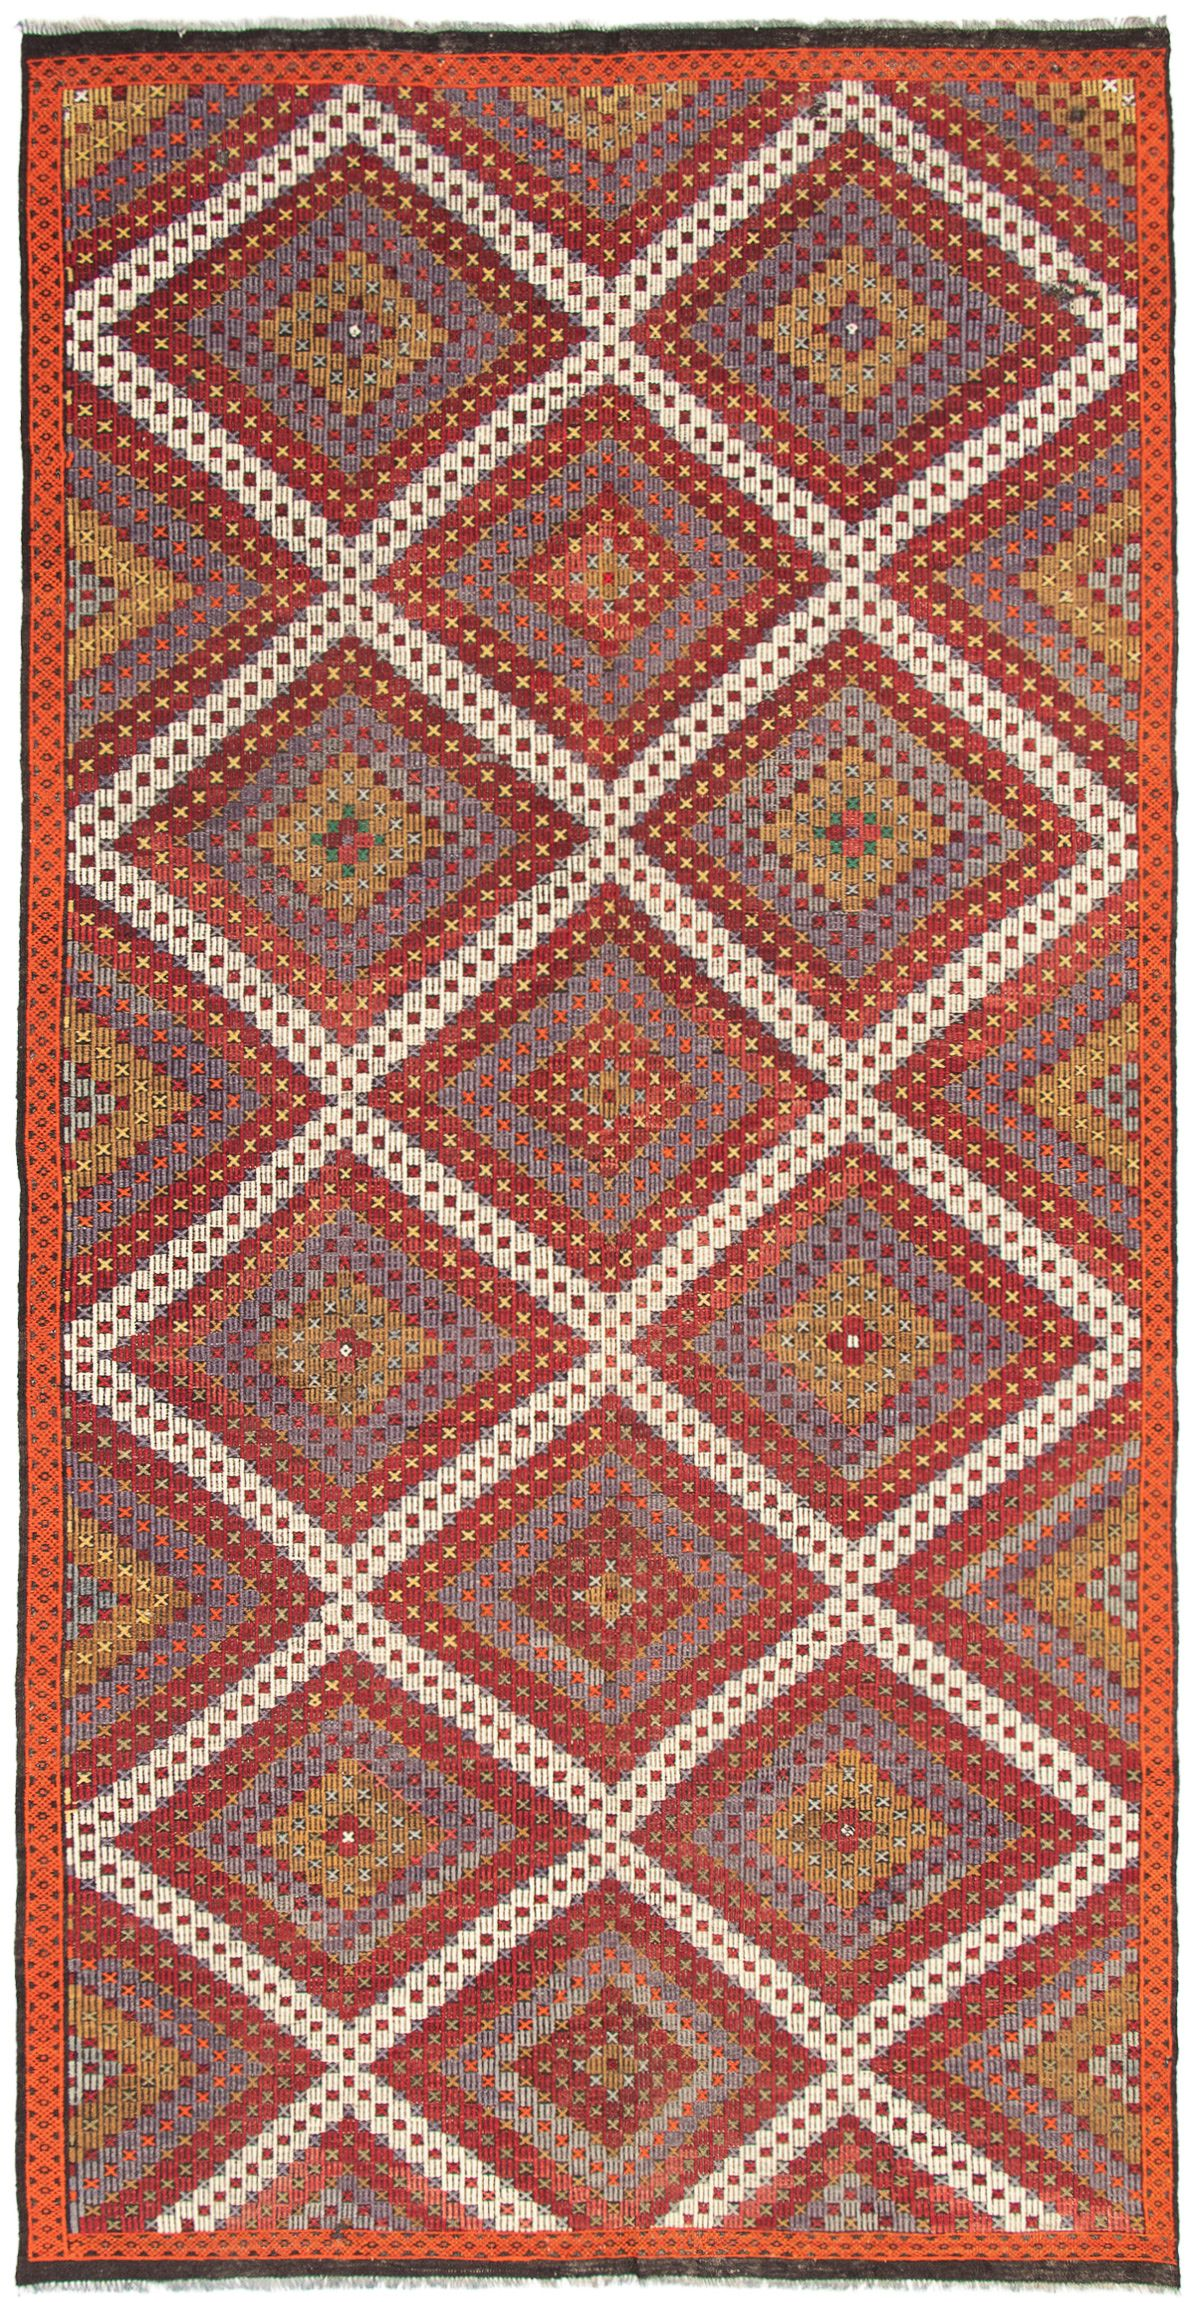 Tapestry | Wool | Dark | Red